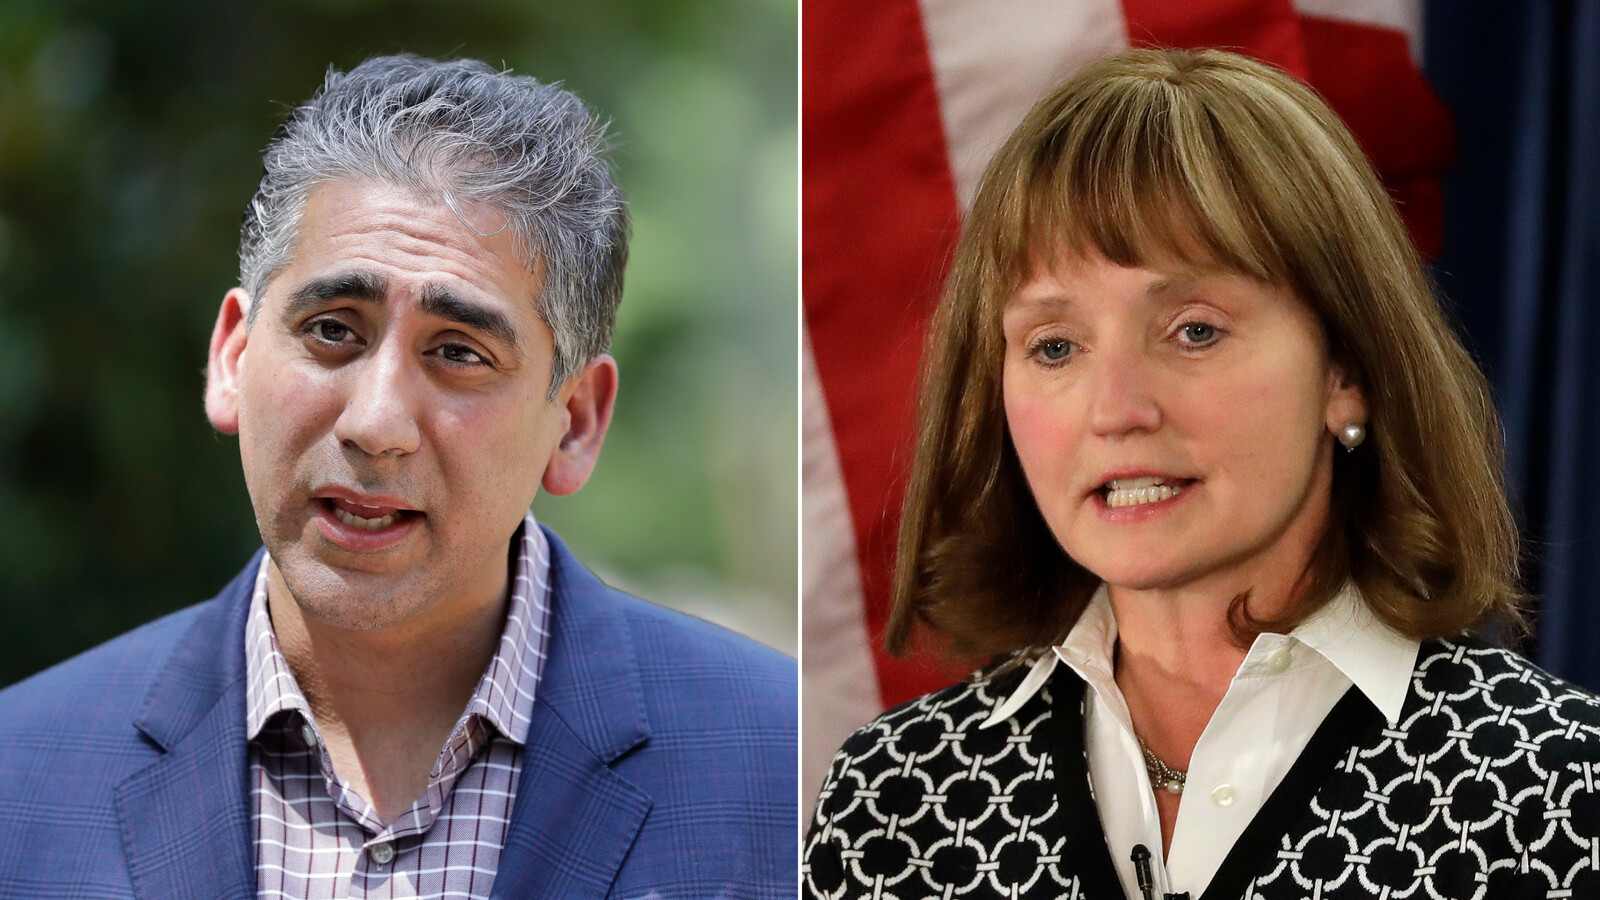 Republicans consider dividing up Nashville district to gain US House seat